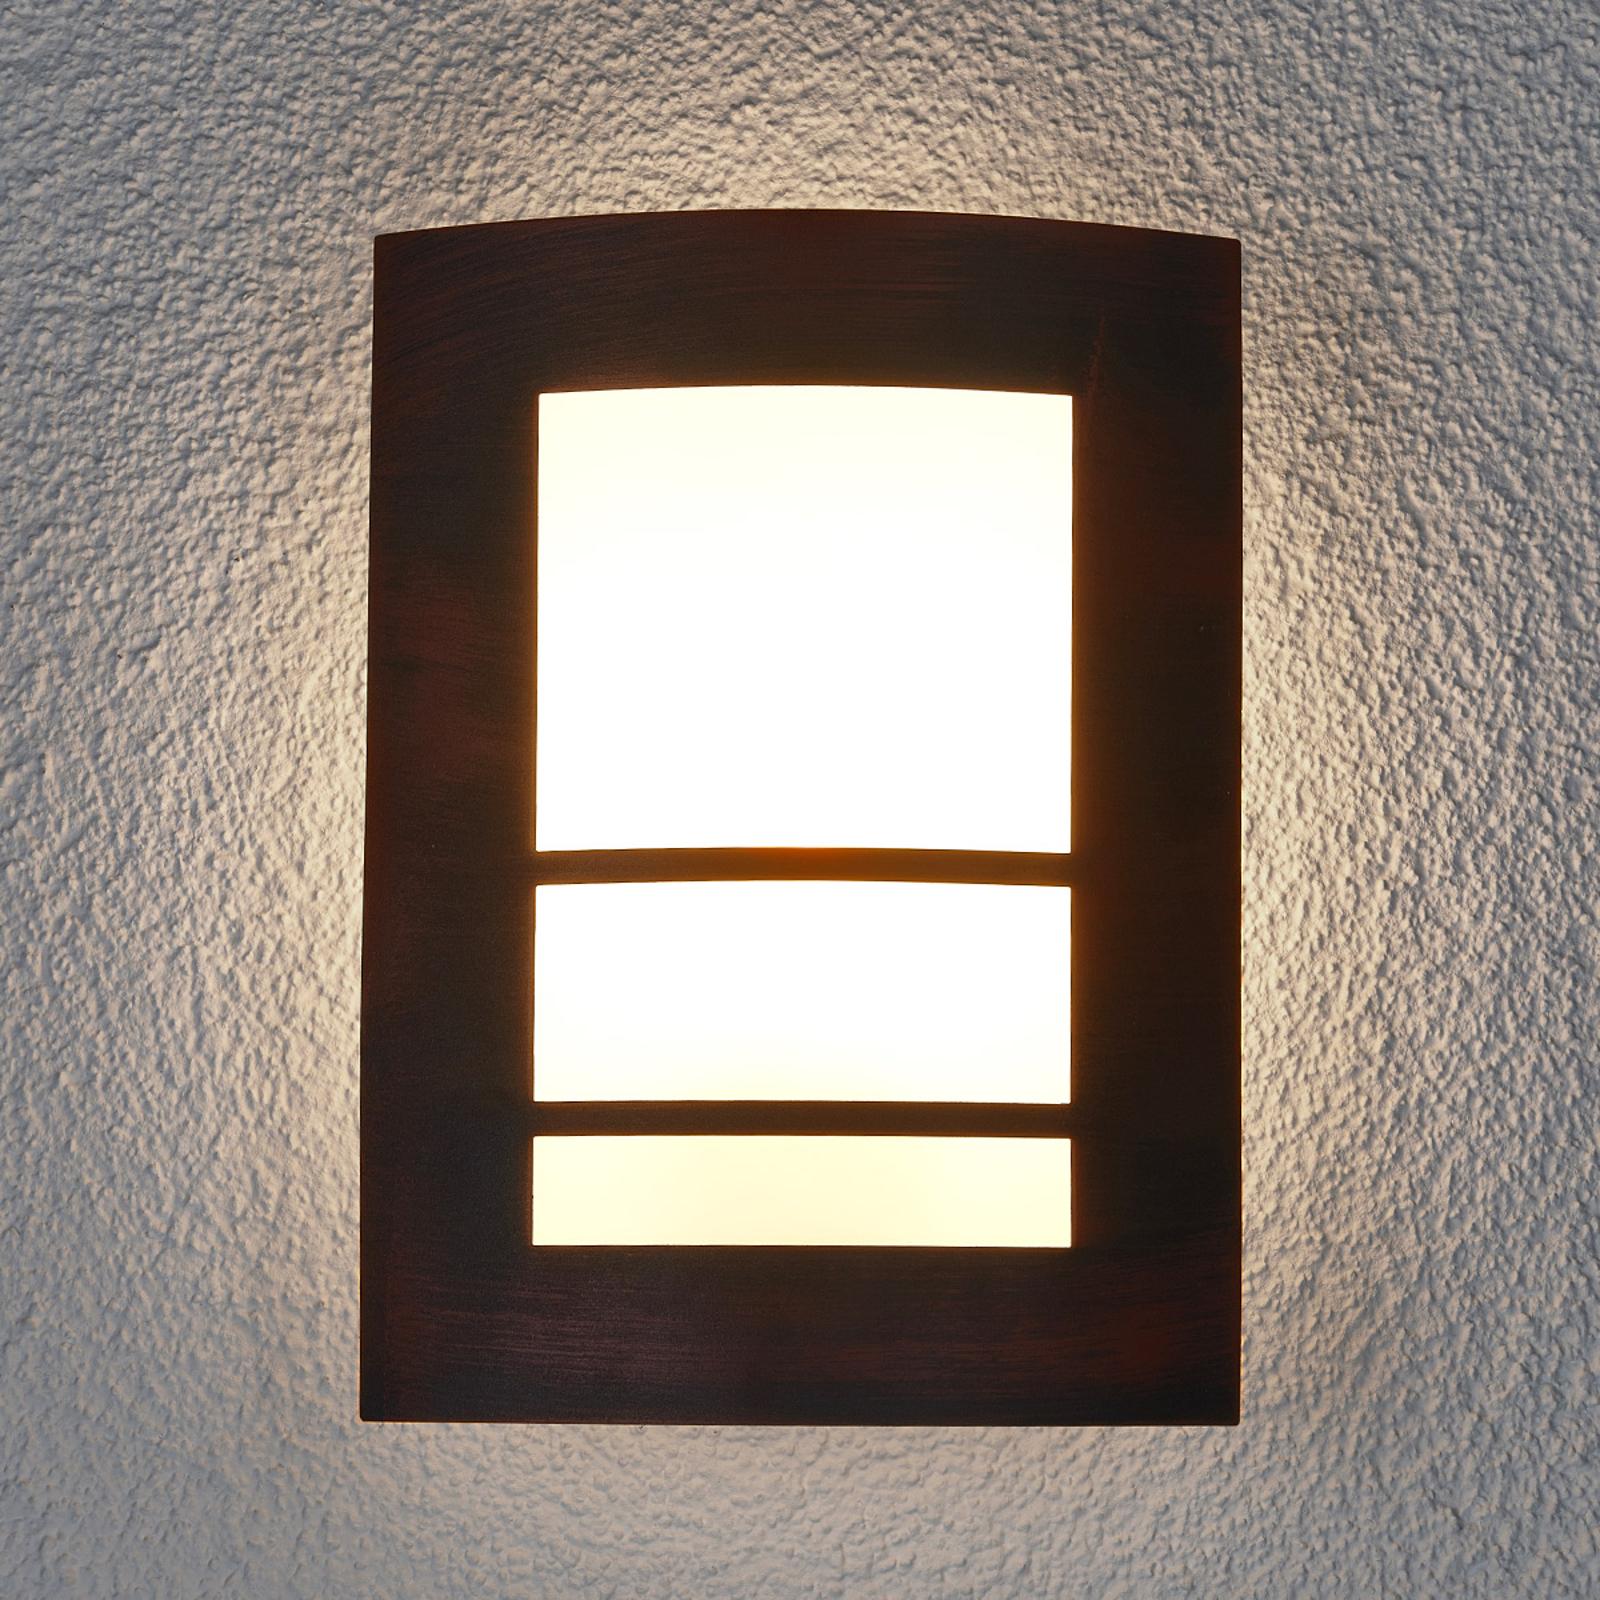 Buitenwandlamp Katalea in roestbruin